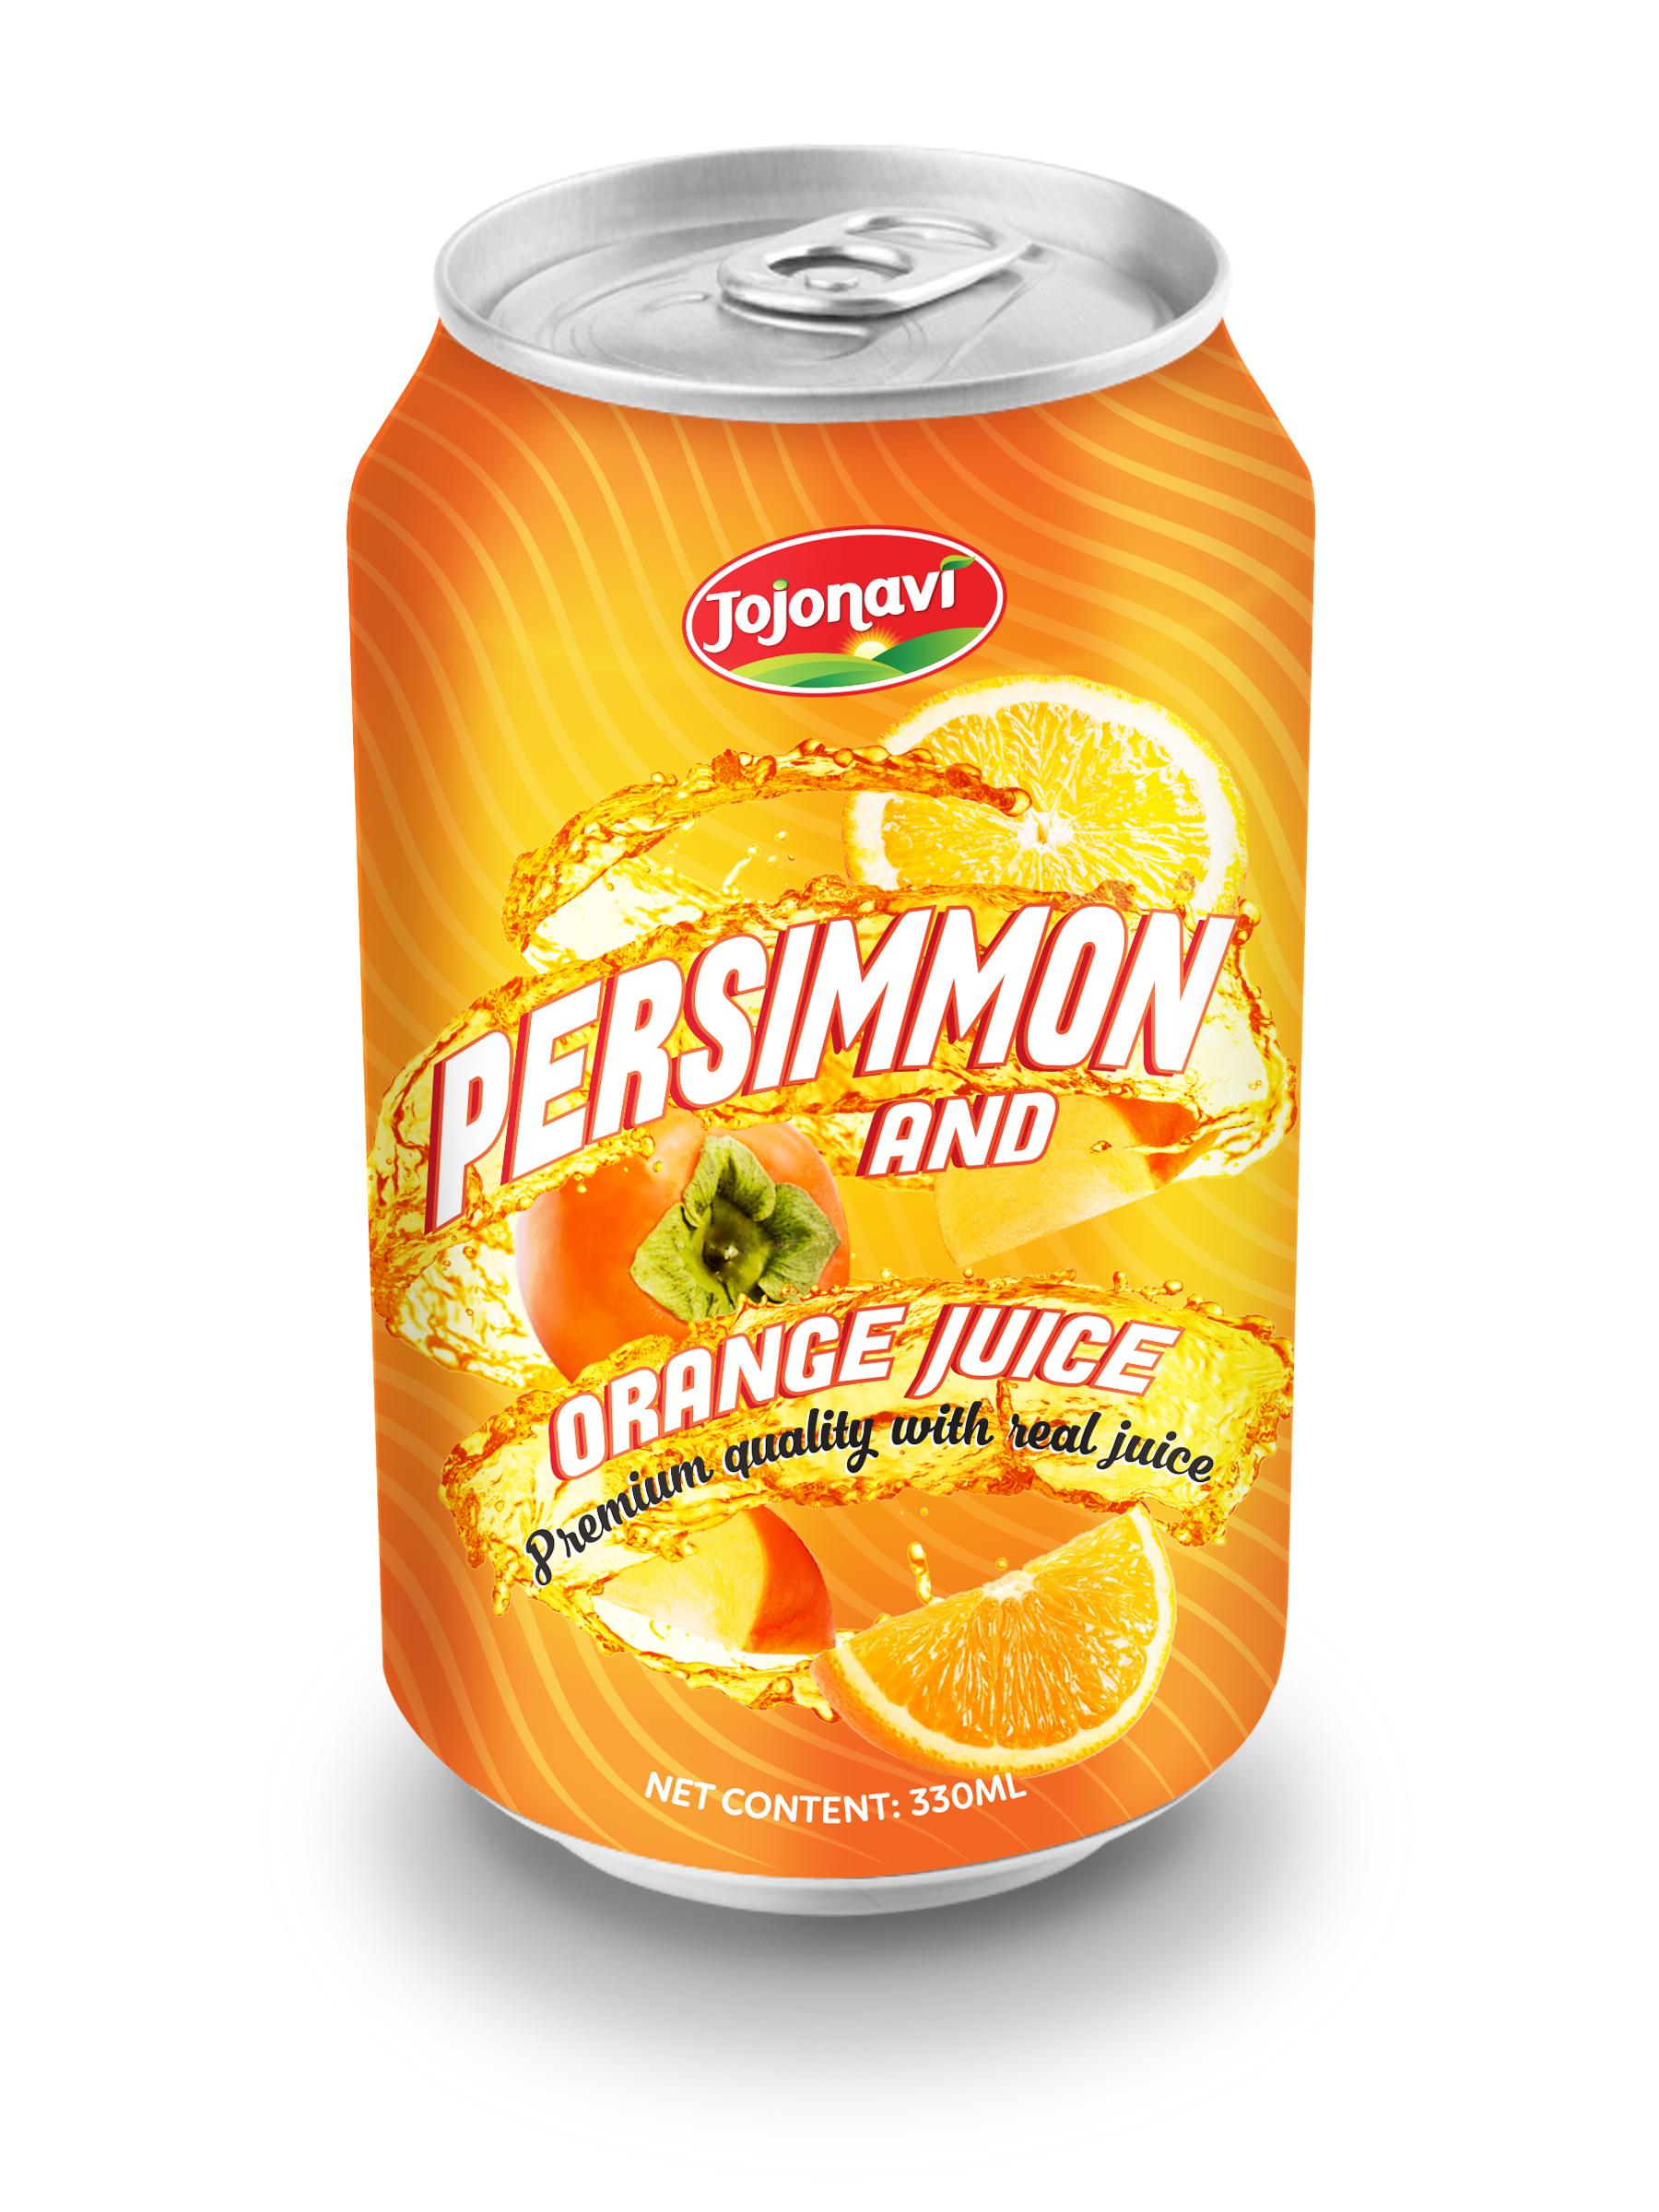 Canned Fruit Juice Supplier Original Persimmon with Orange Juice ...